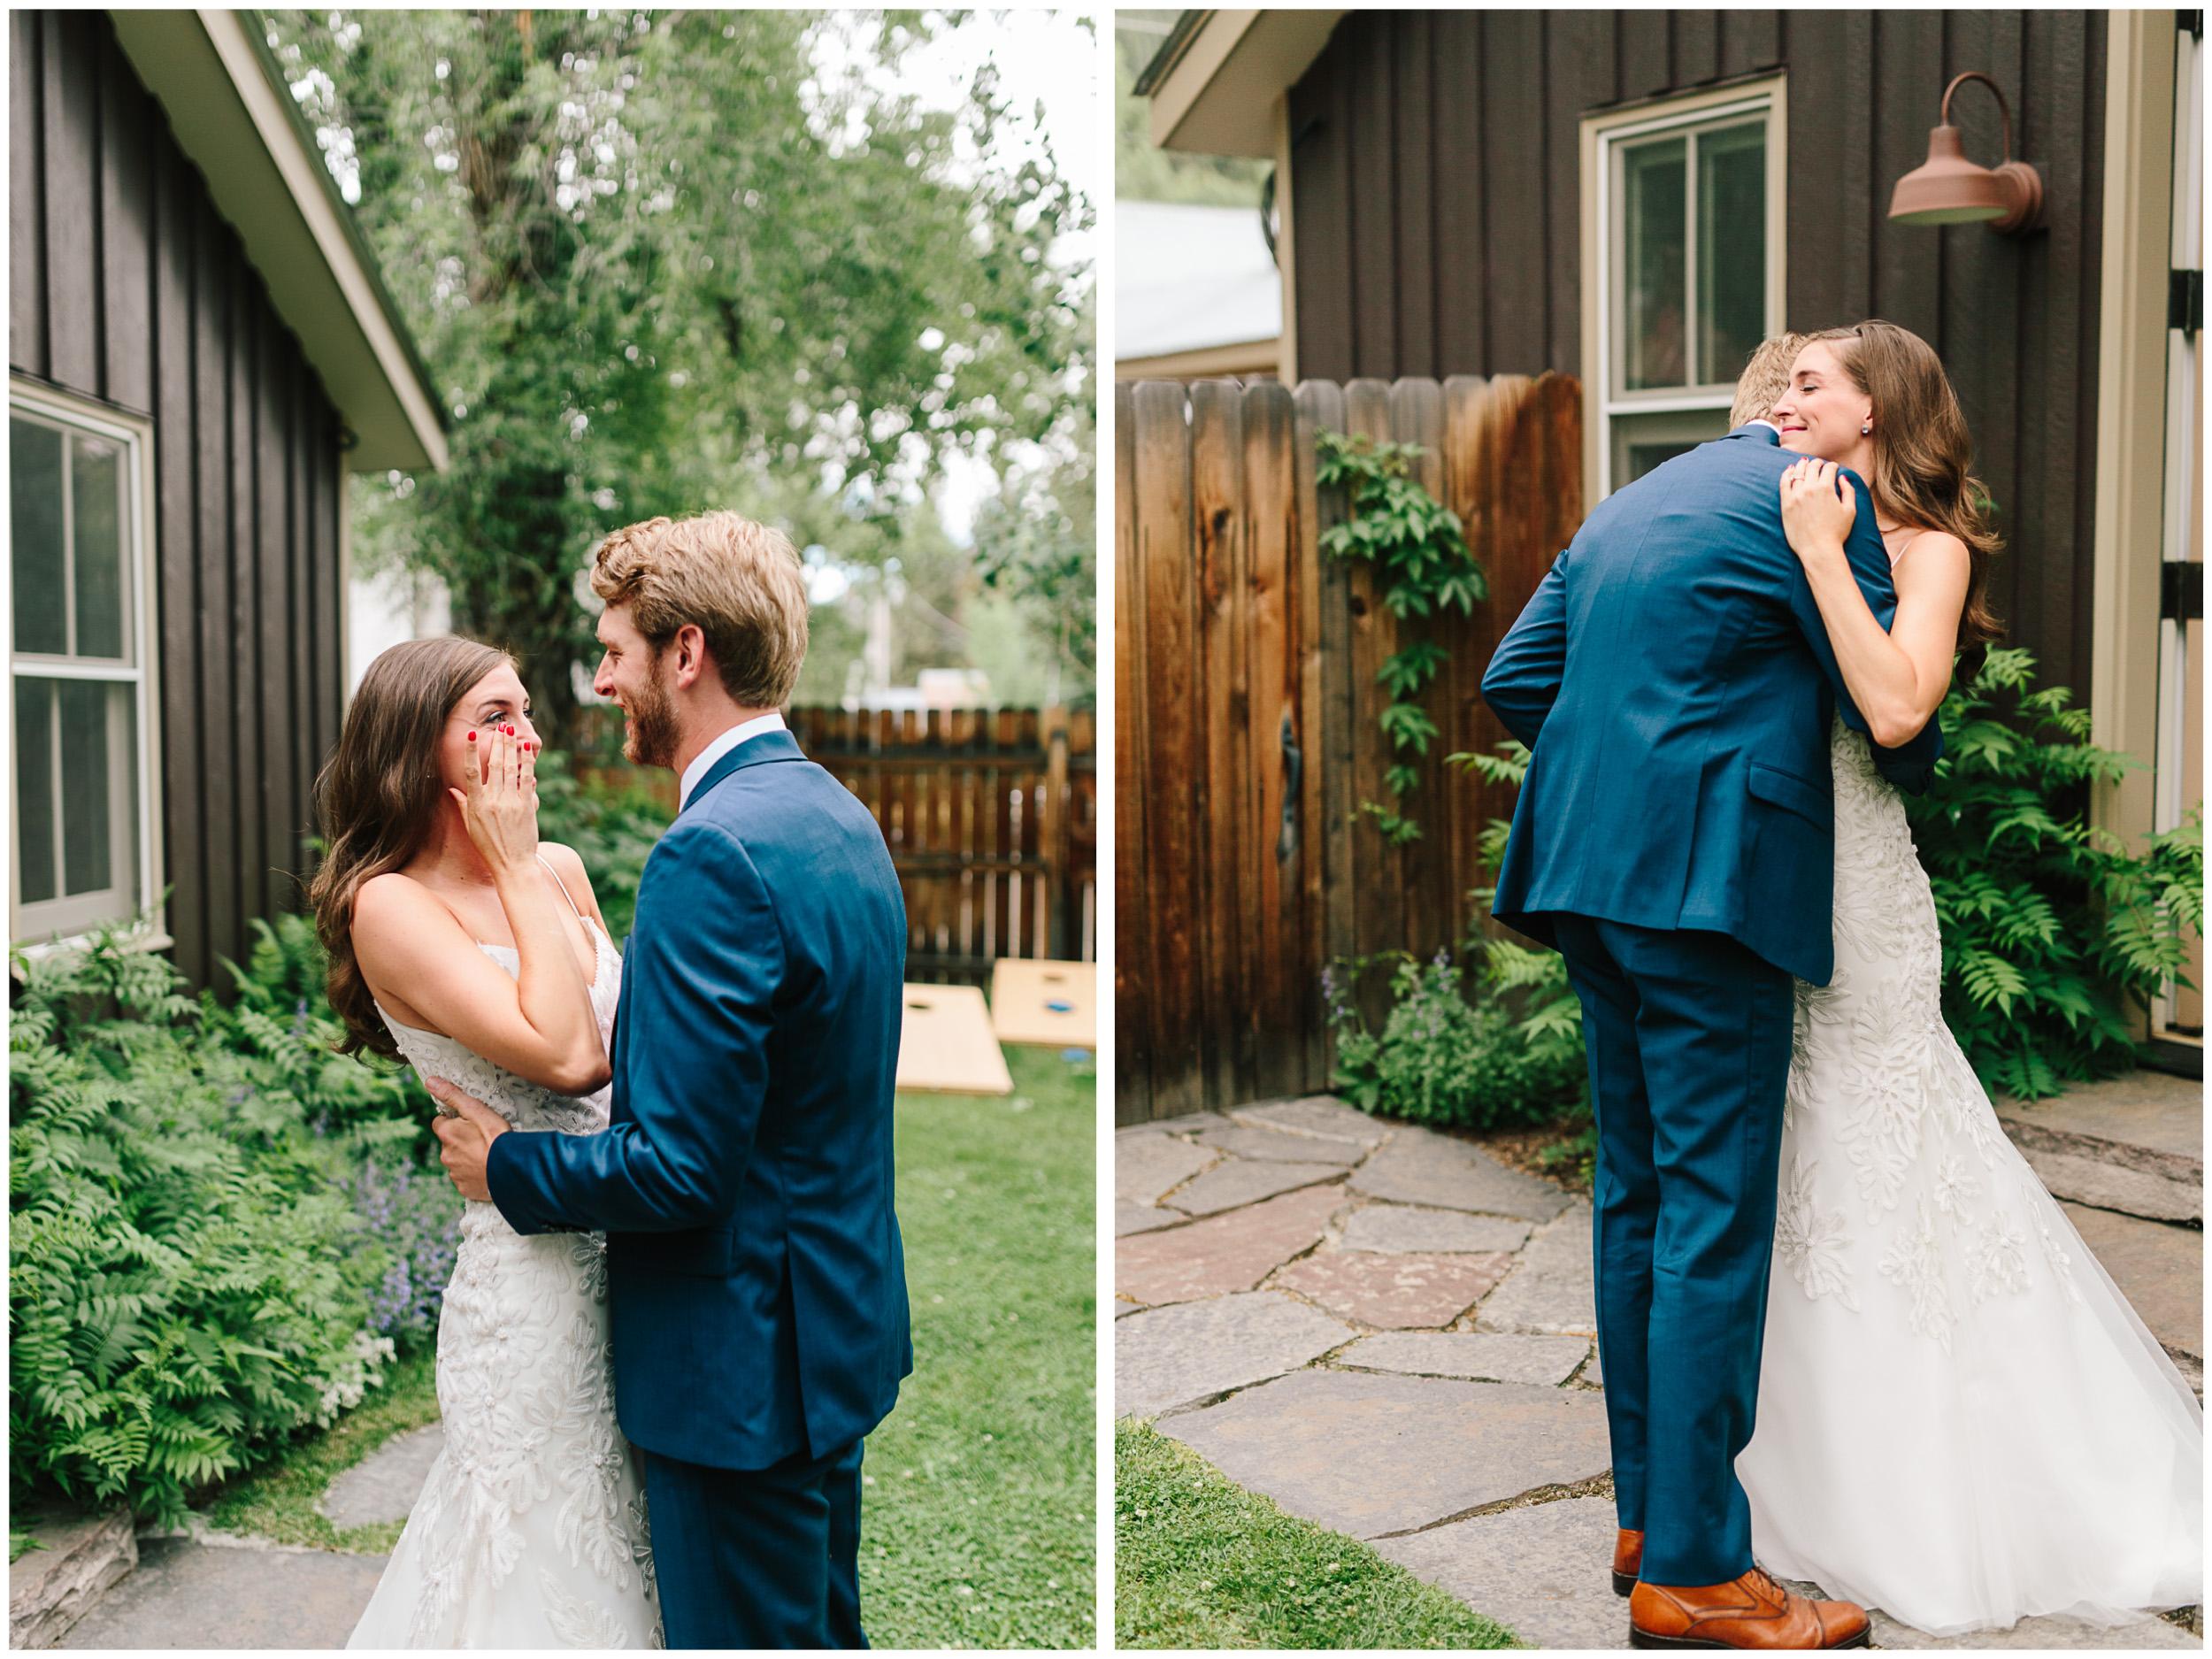 crested_butte_wedding_39.jpg